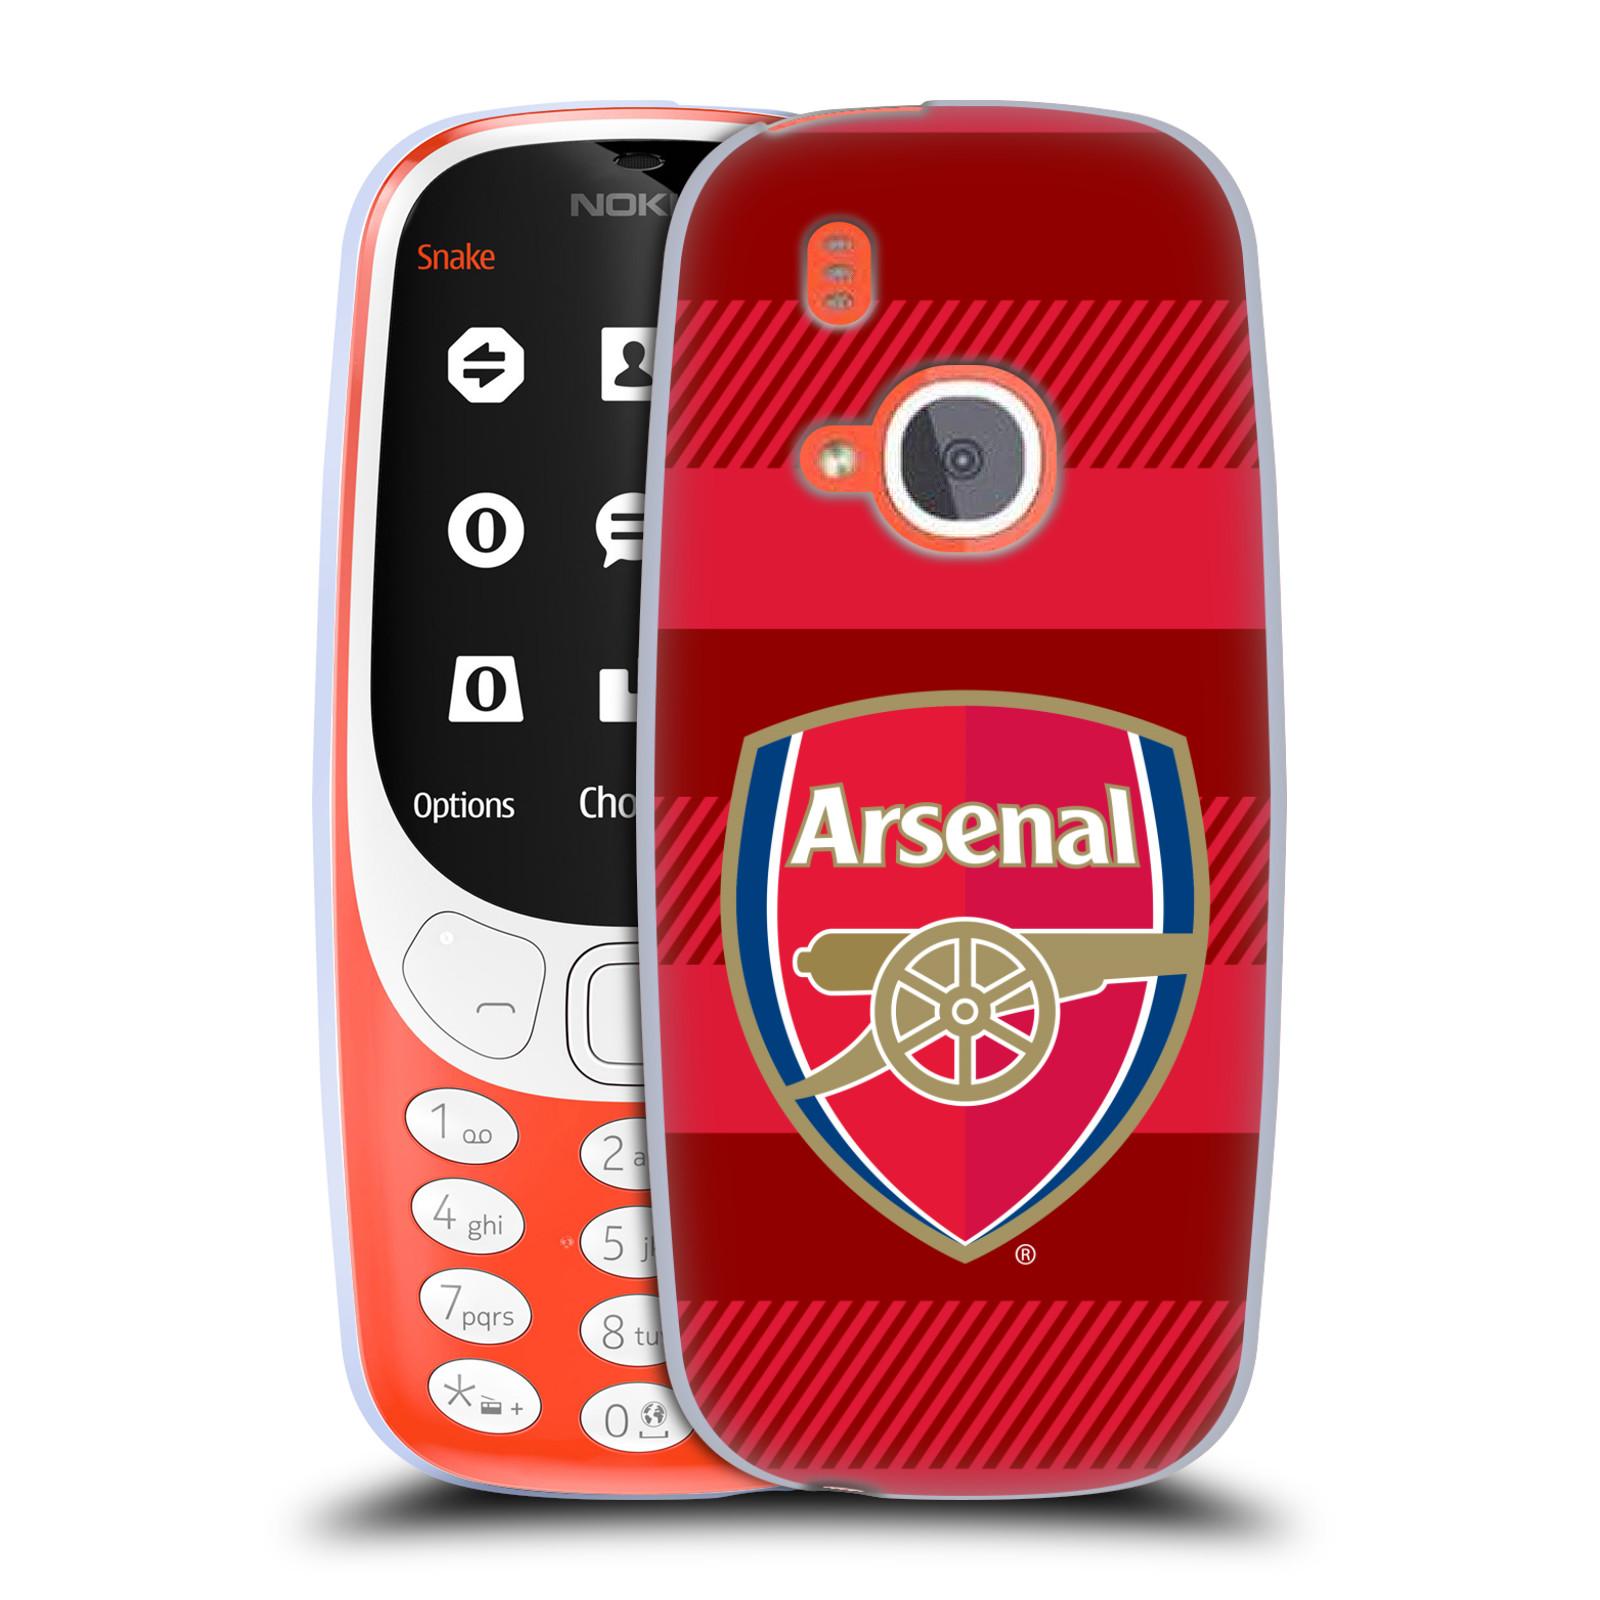 Silikonové pouzdro na mobil Nokia 3310 - Head Case - Arsenal FC - Logo s pruhy